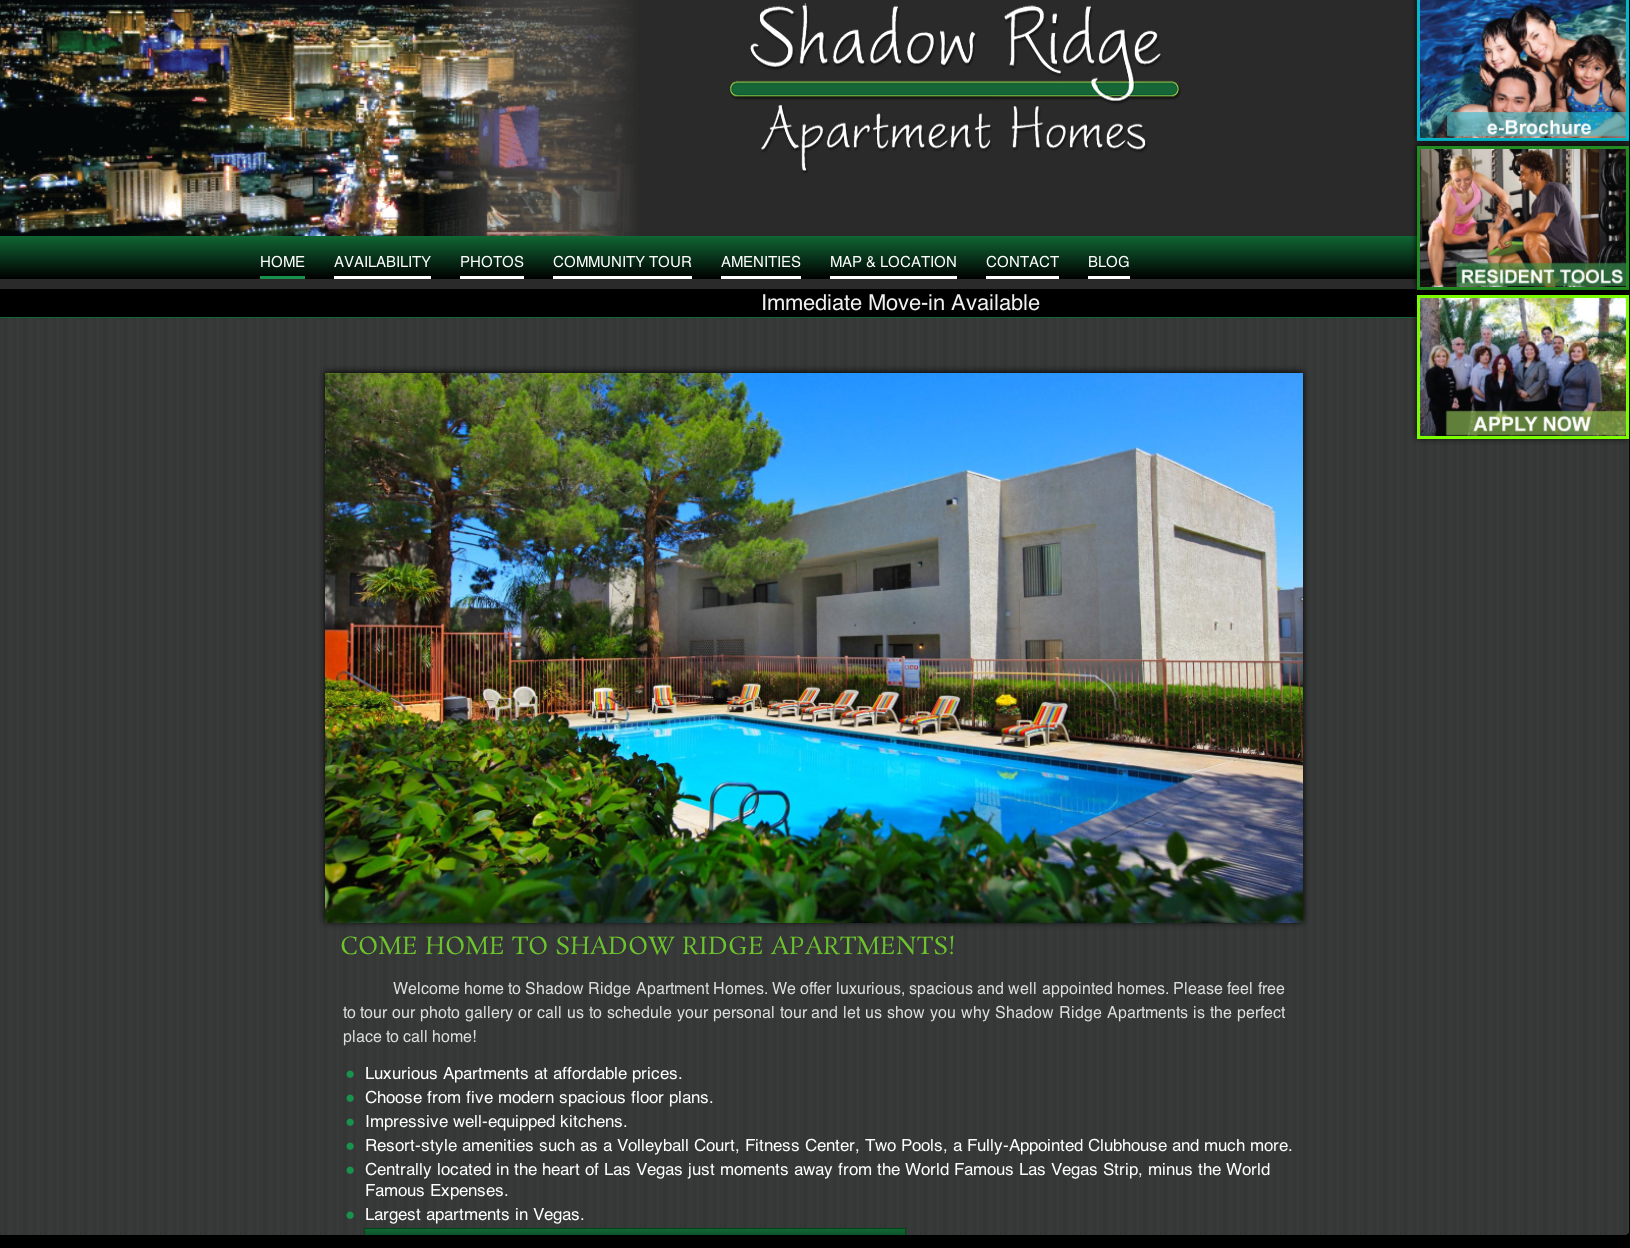 Website Designed by Jeff Shadow Ridge Apartments • 3200